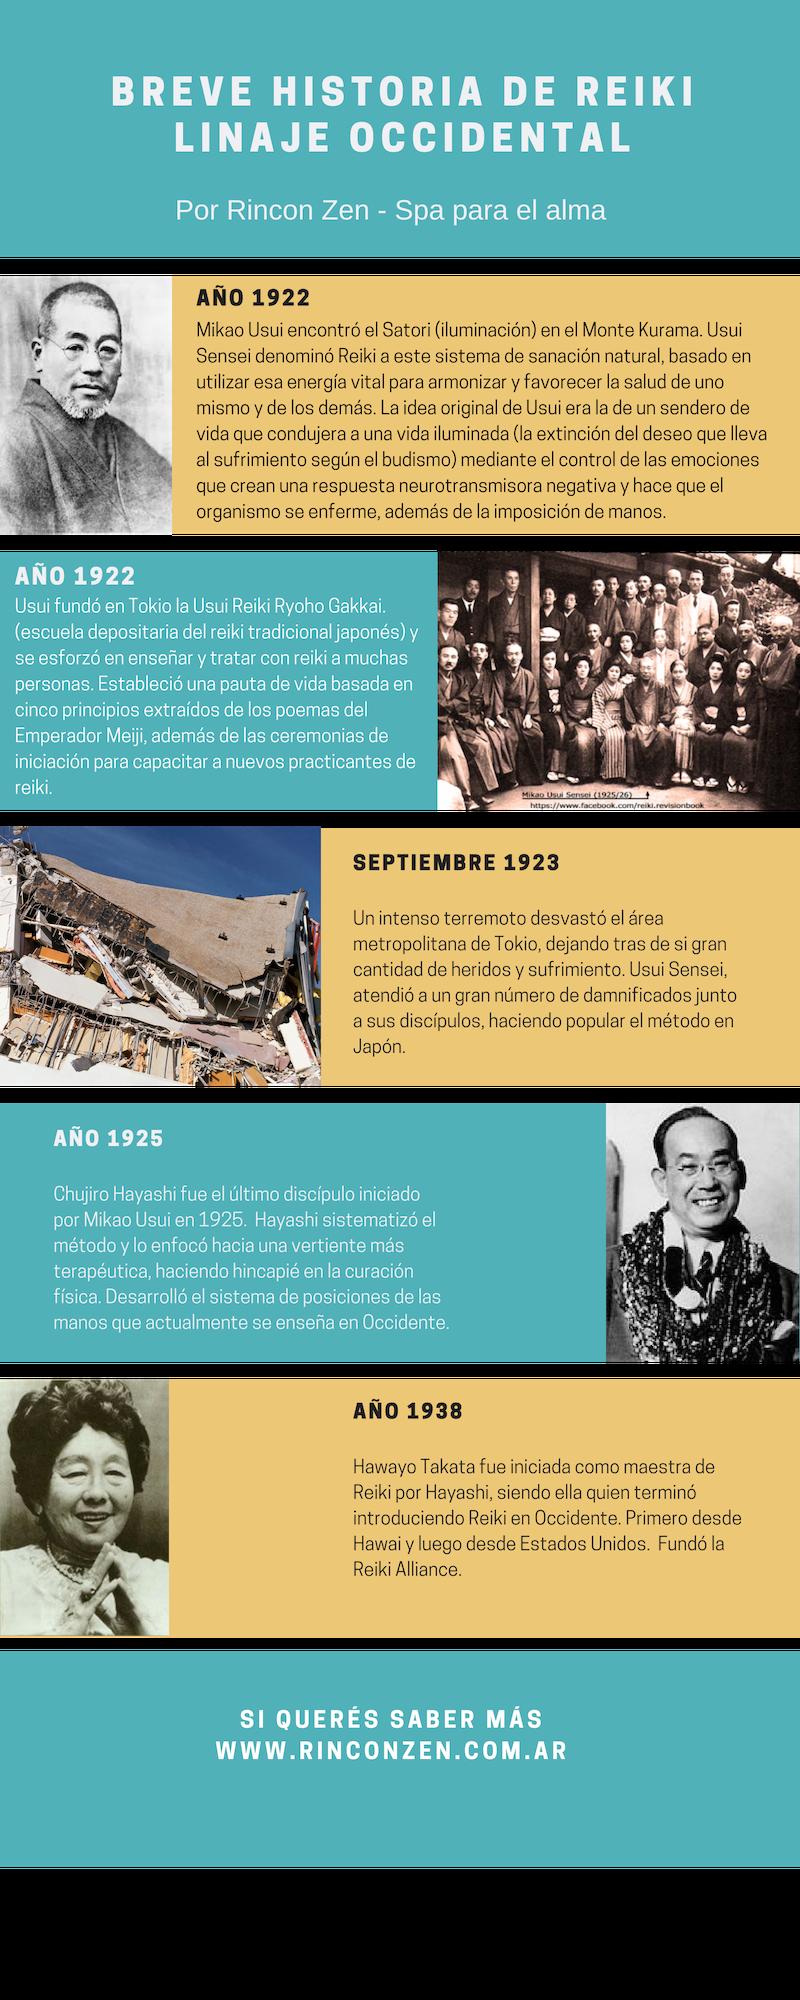 Historia de reiki - Infografía